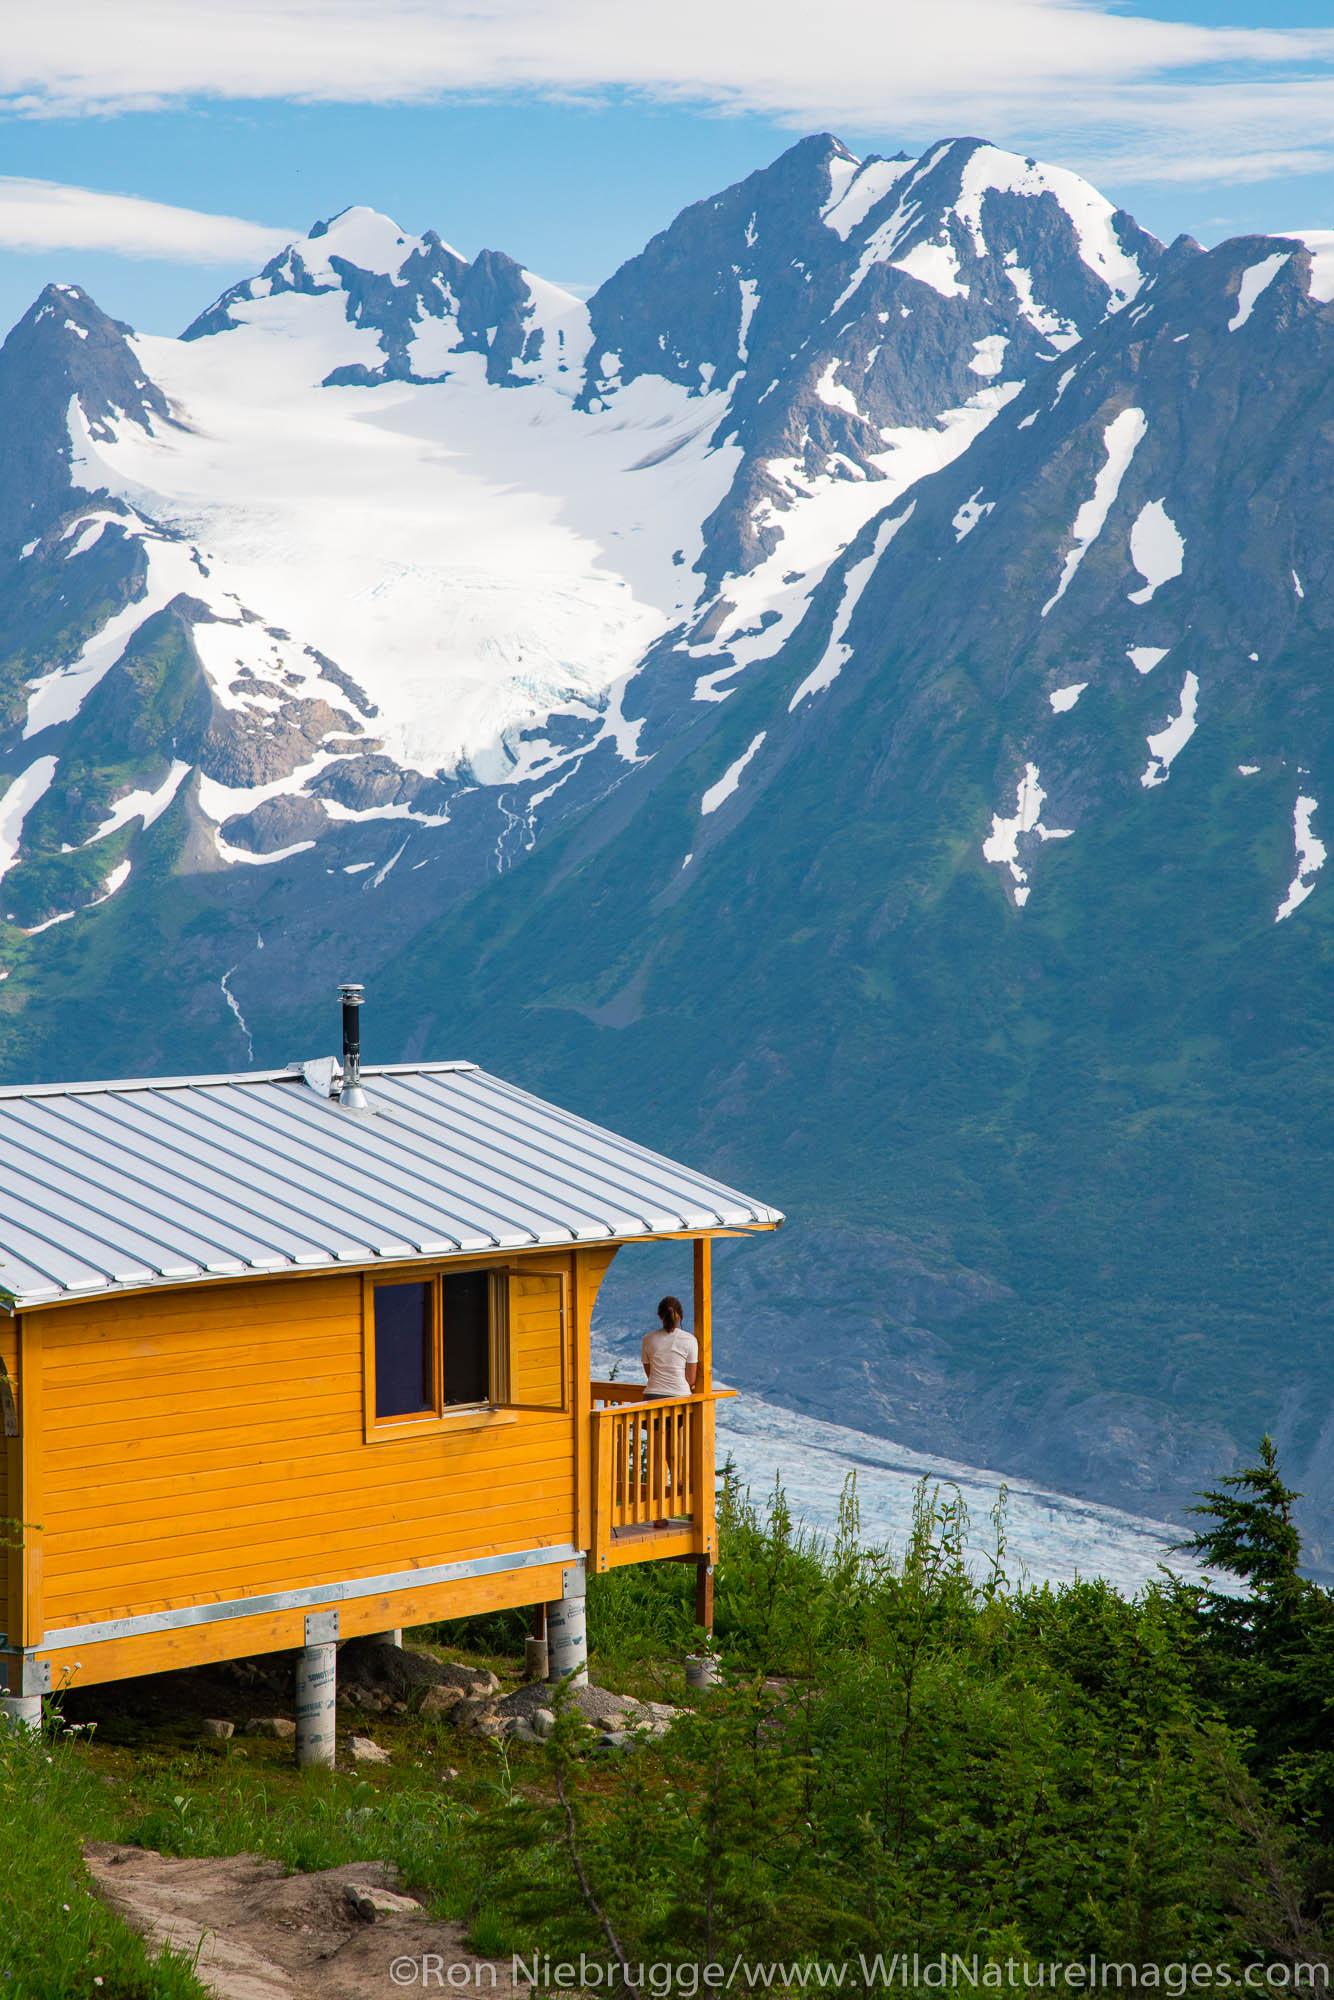 Backpacking trip to the Spencer Glacier Bench Forest Service Cabin, Chugach National Forest, Alaska.